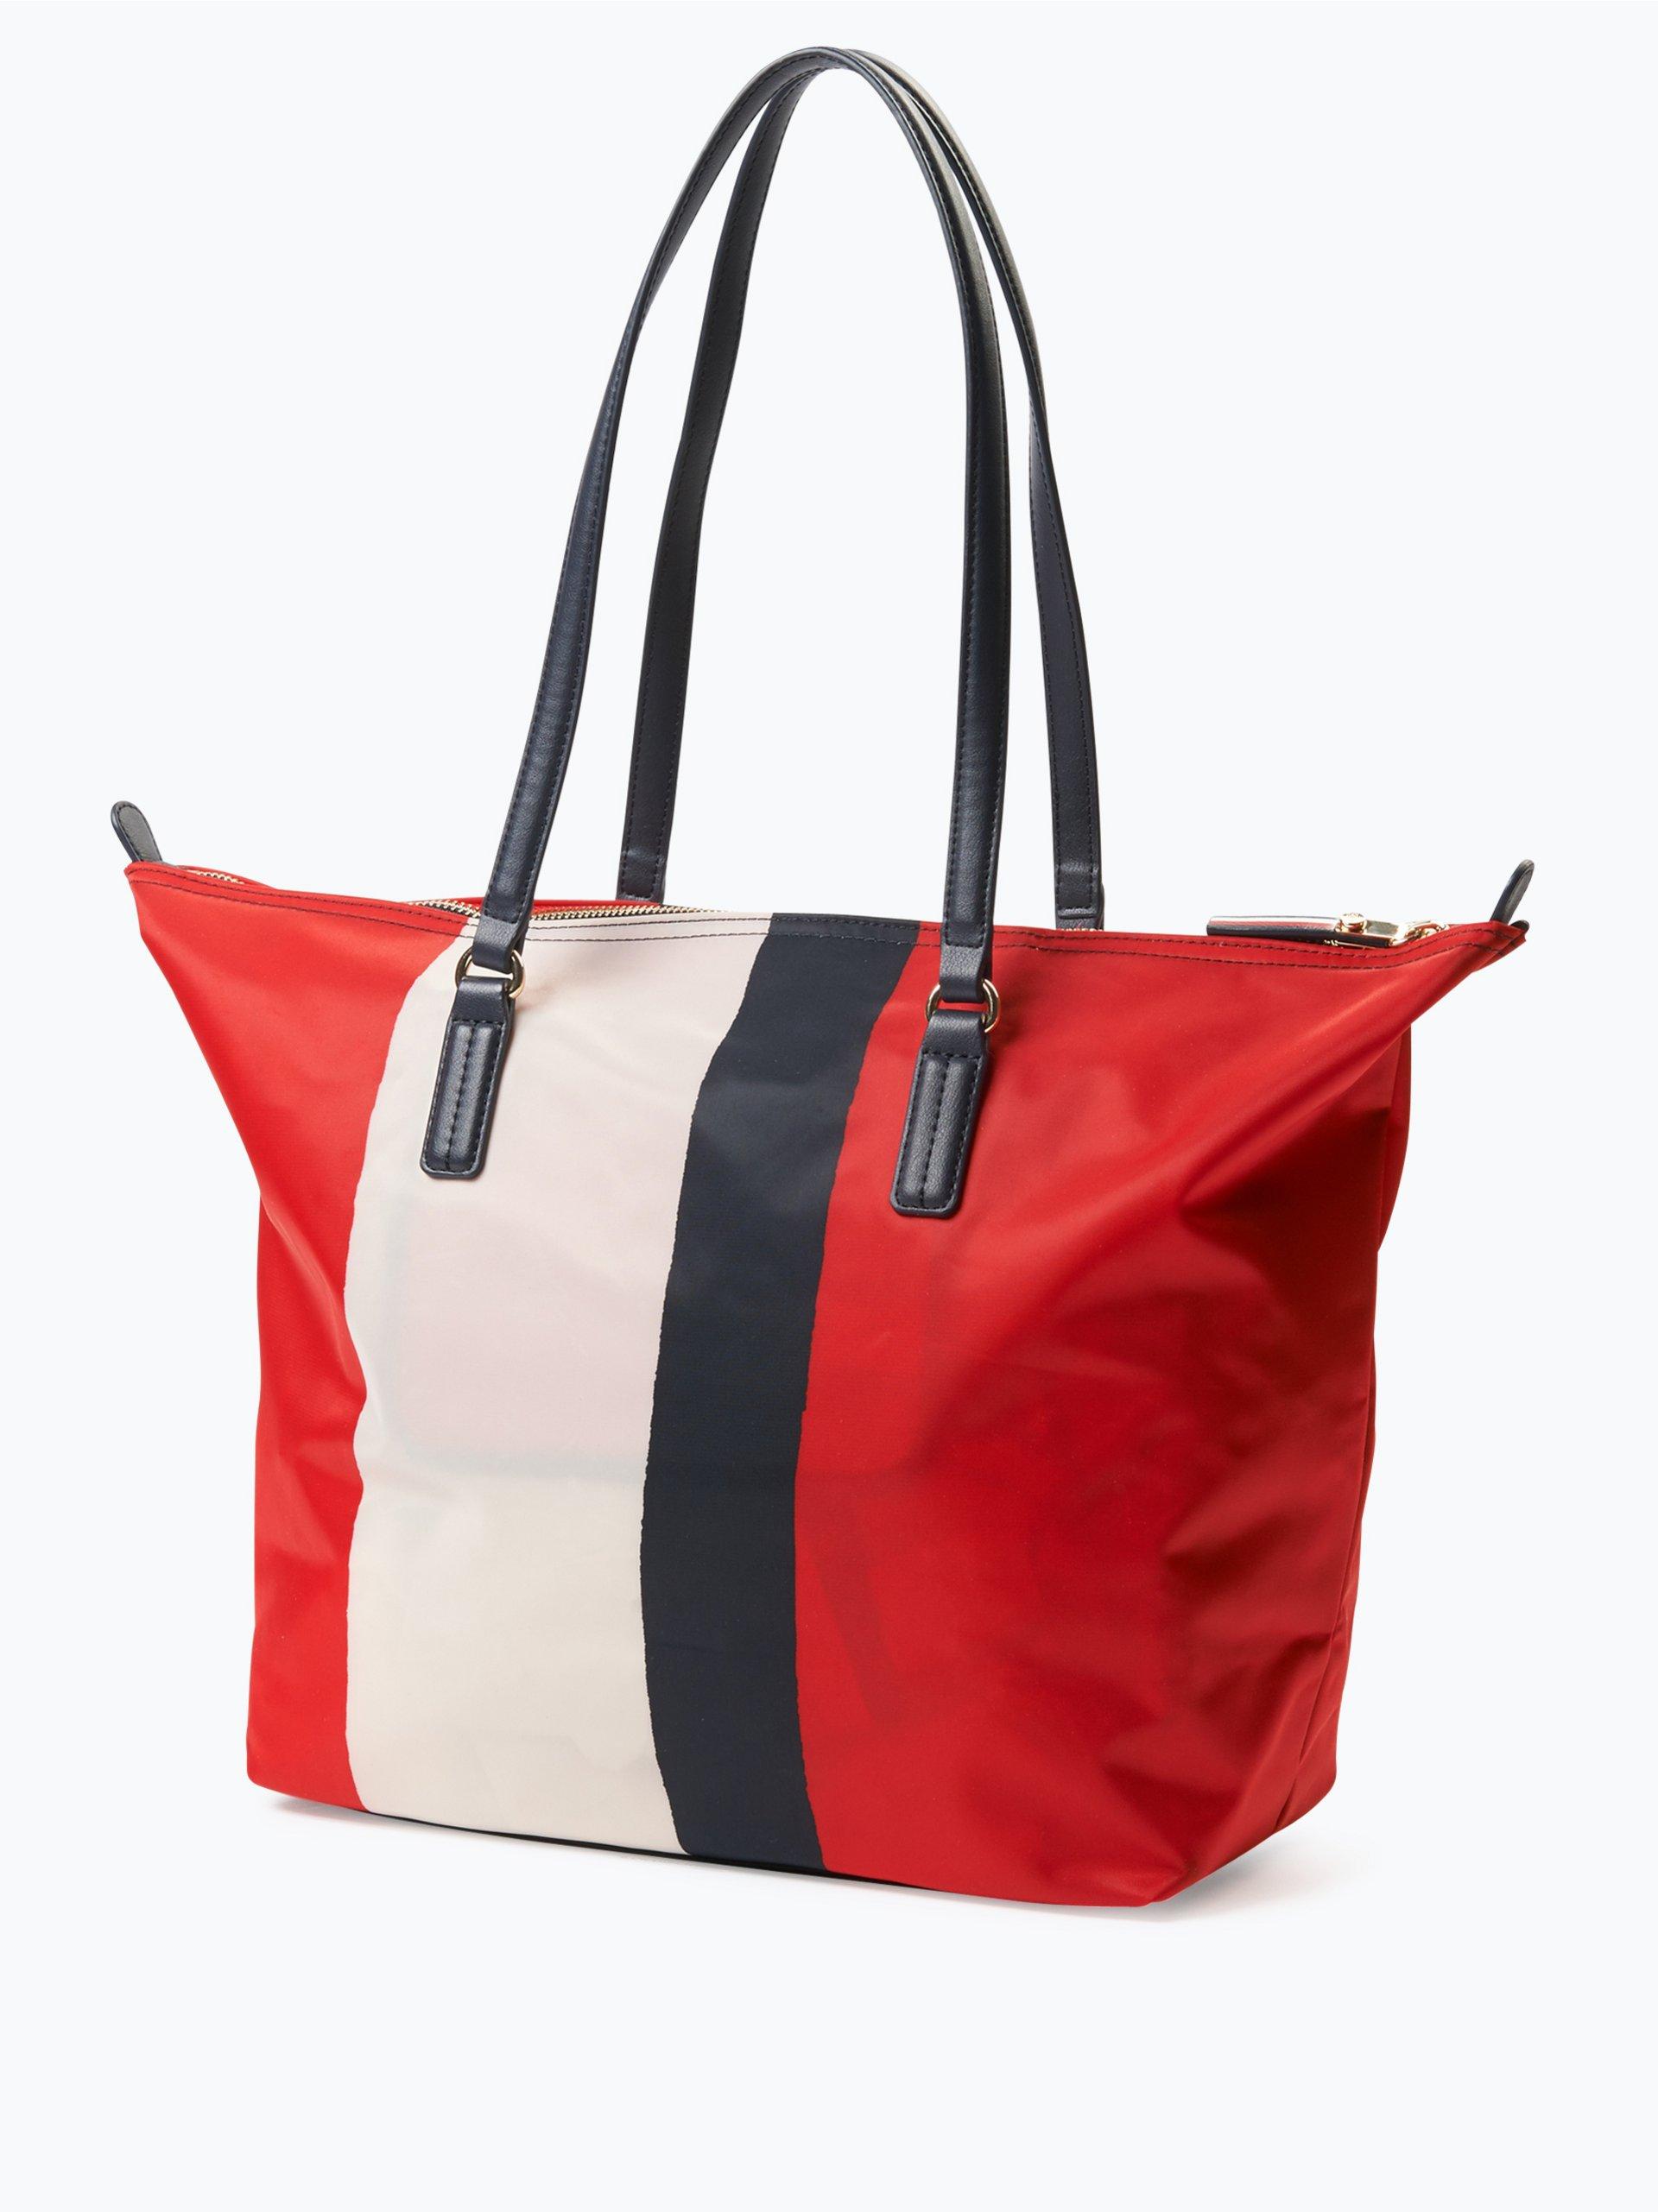 tommy hilfiger damen shopper rot gestreift online kaufen. Black Bedroom Furniture Sets. Home Design Ideas